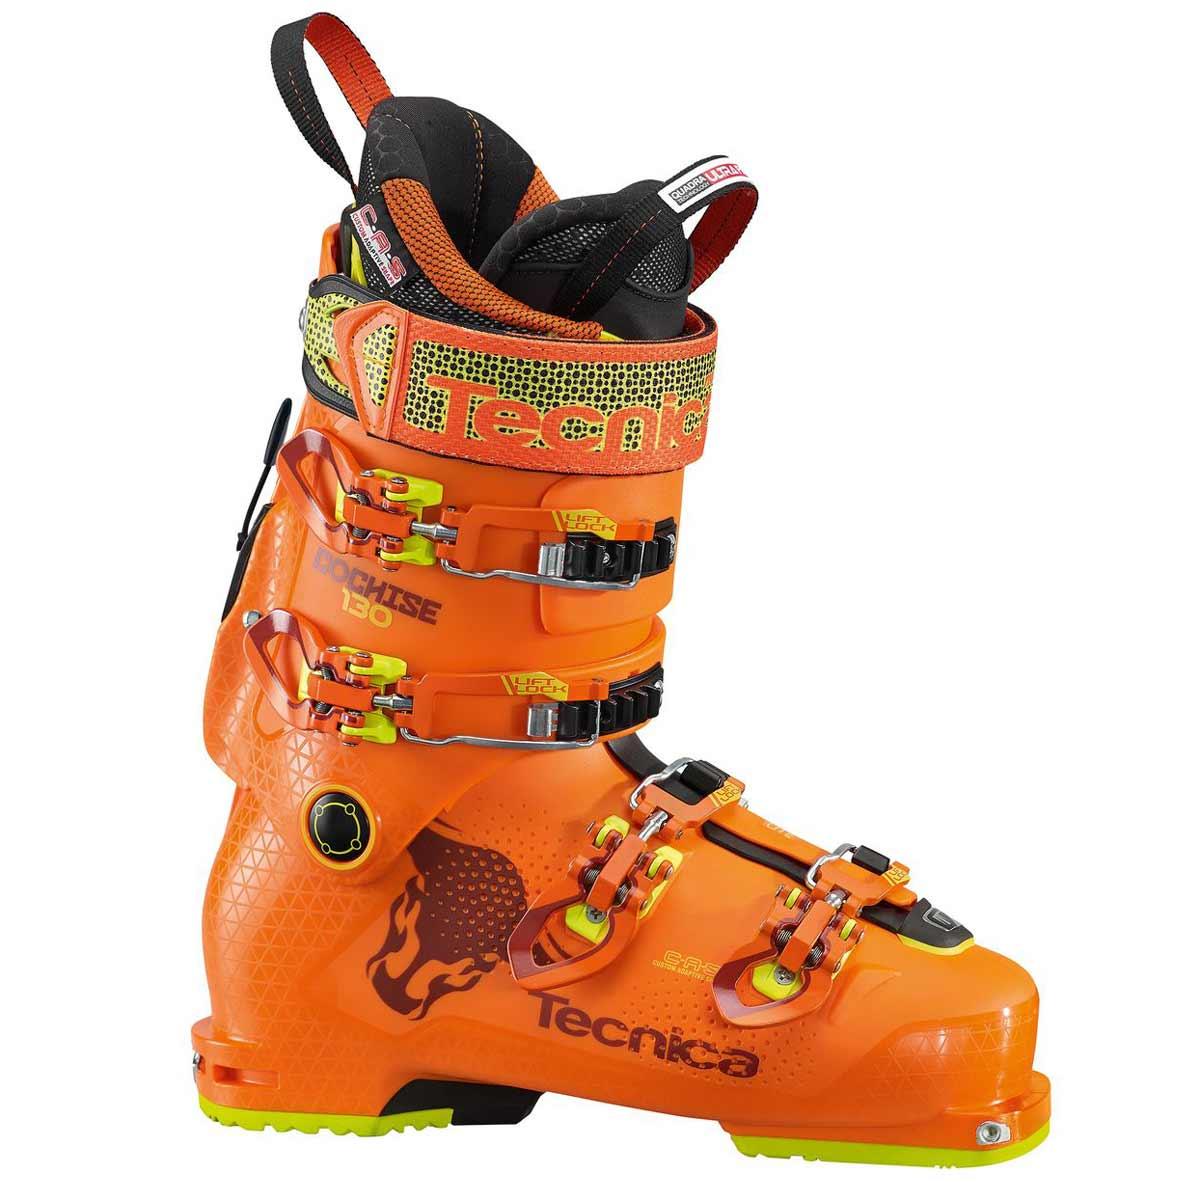 Tecnica Men's Cochise 130 Ski Boots On Sale